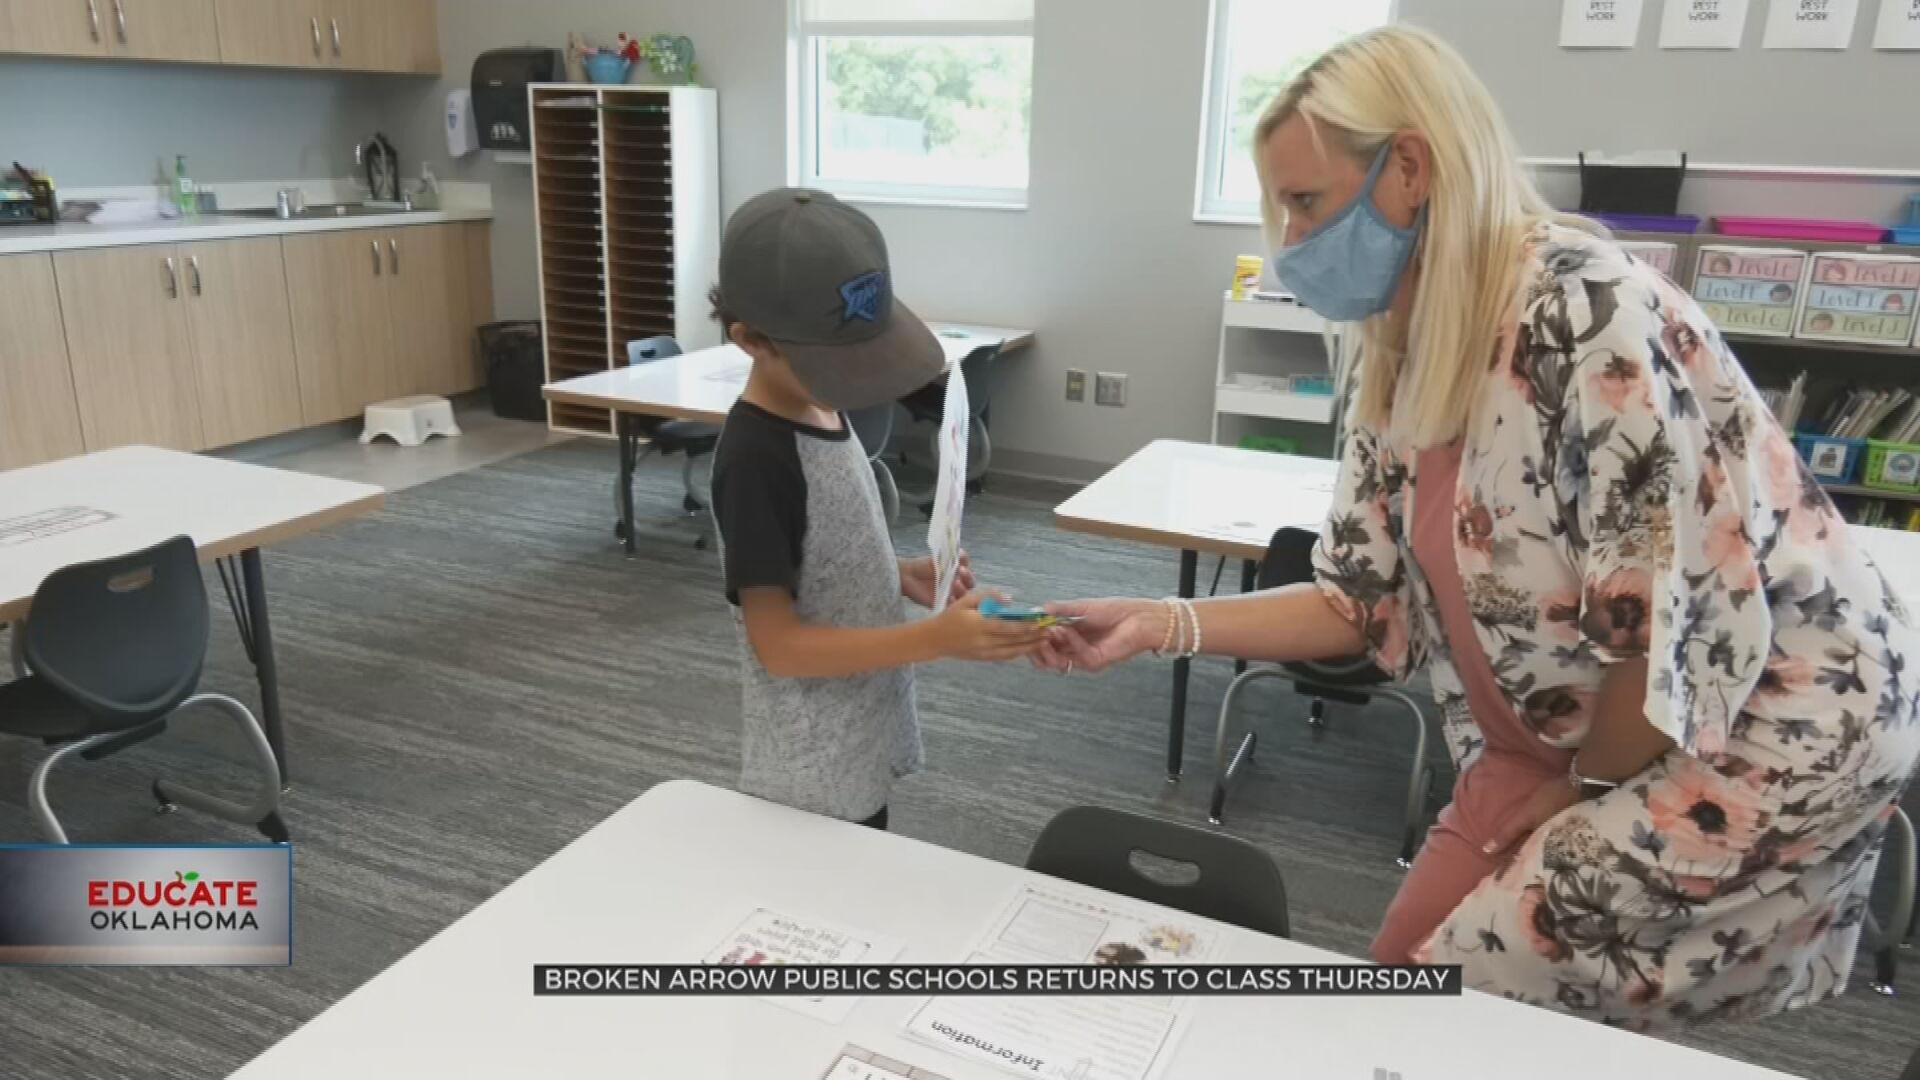 Broken Arrow Public Schools 'Ready To Have Kids Back' On Thursday